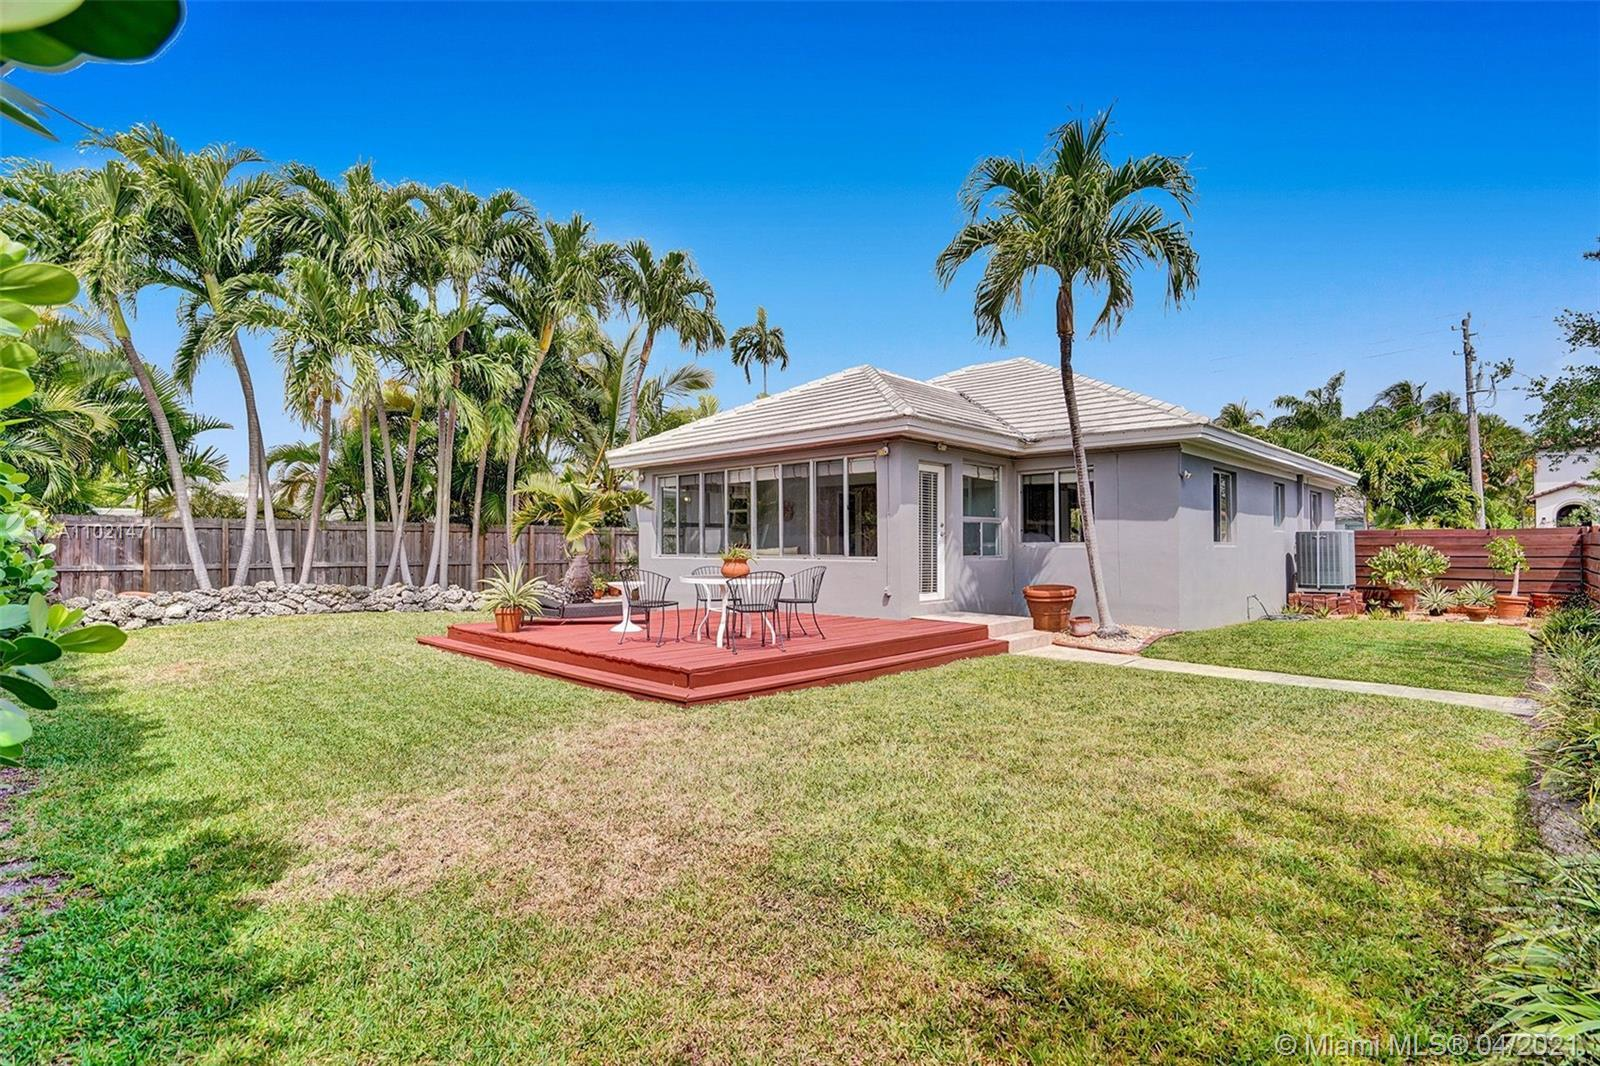 1300 Daytonia Rd, Miami Beach, FL, 33141